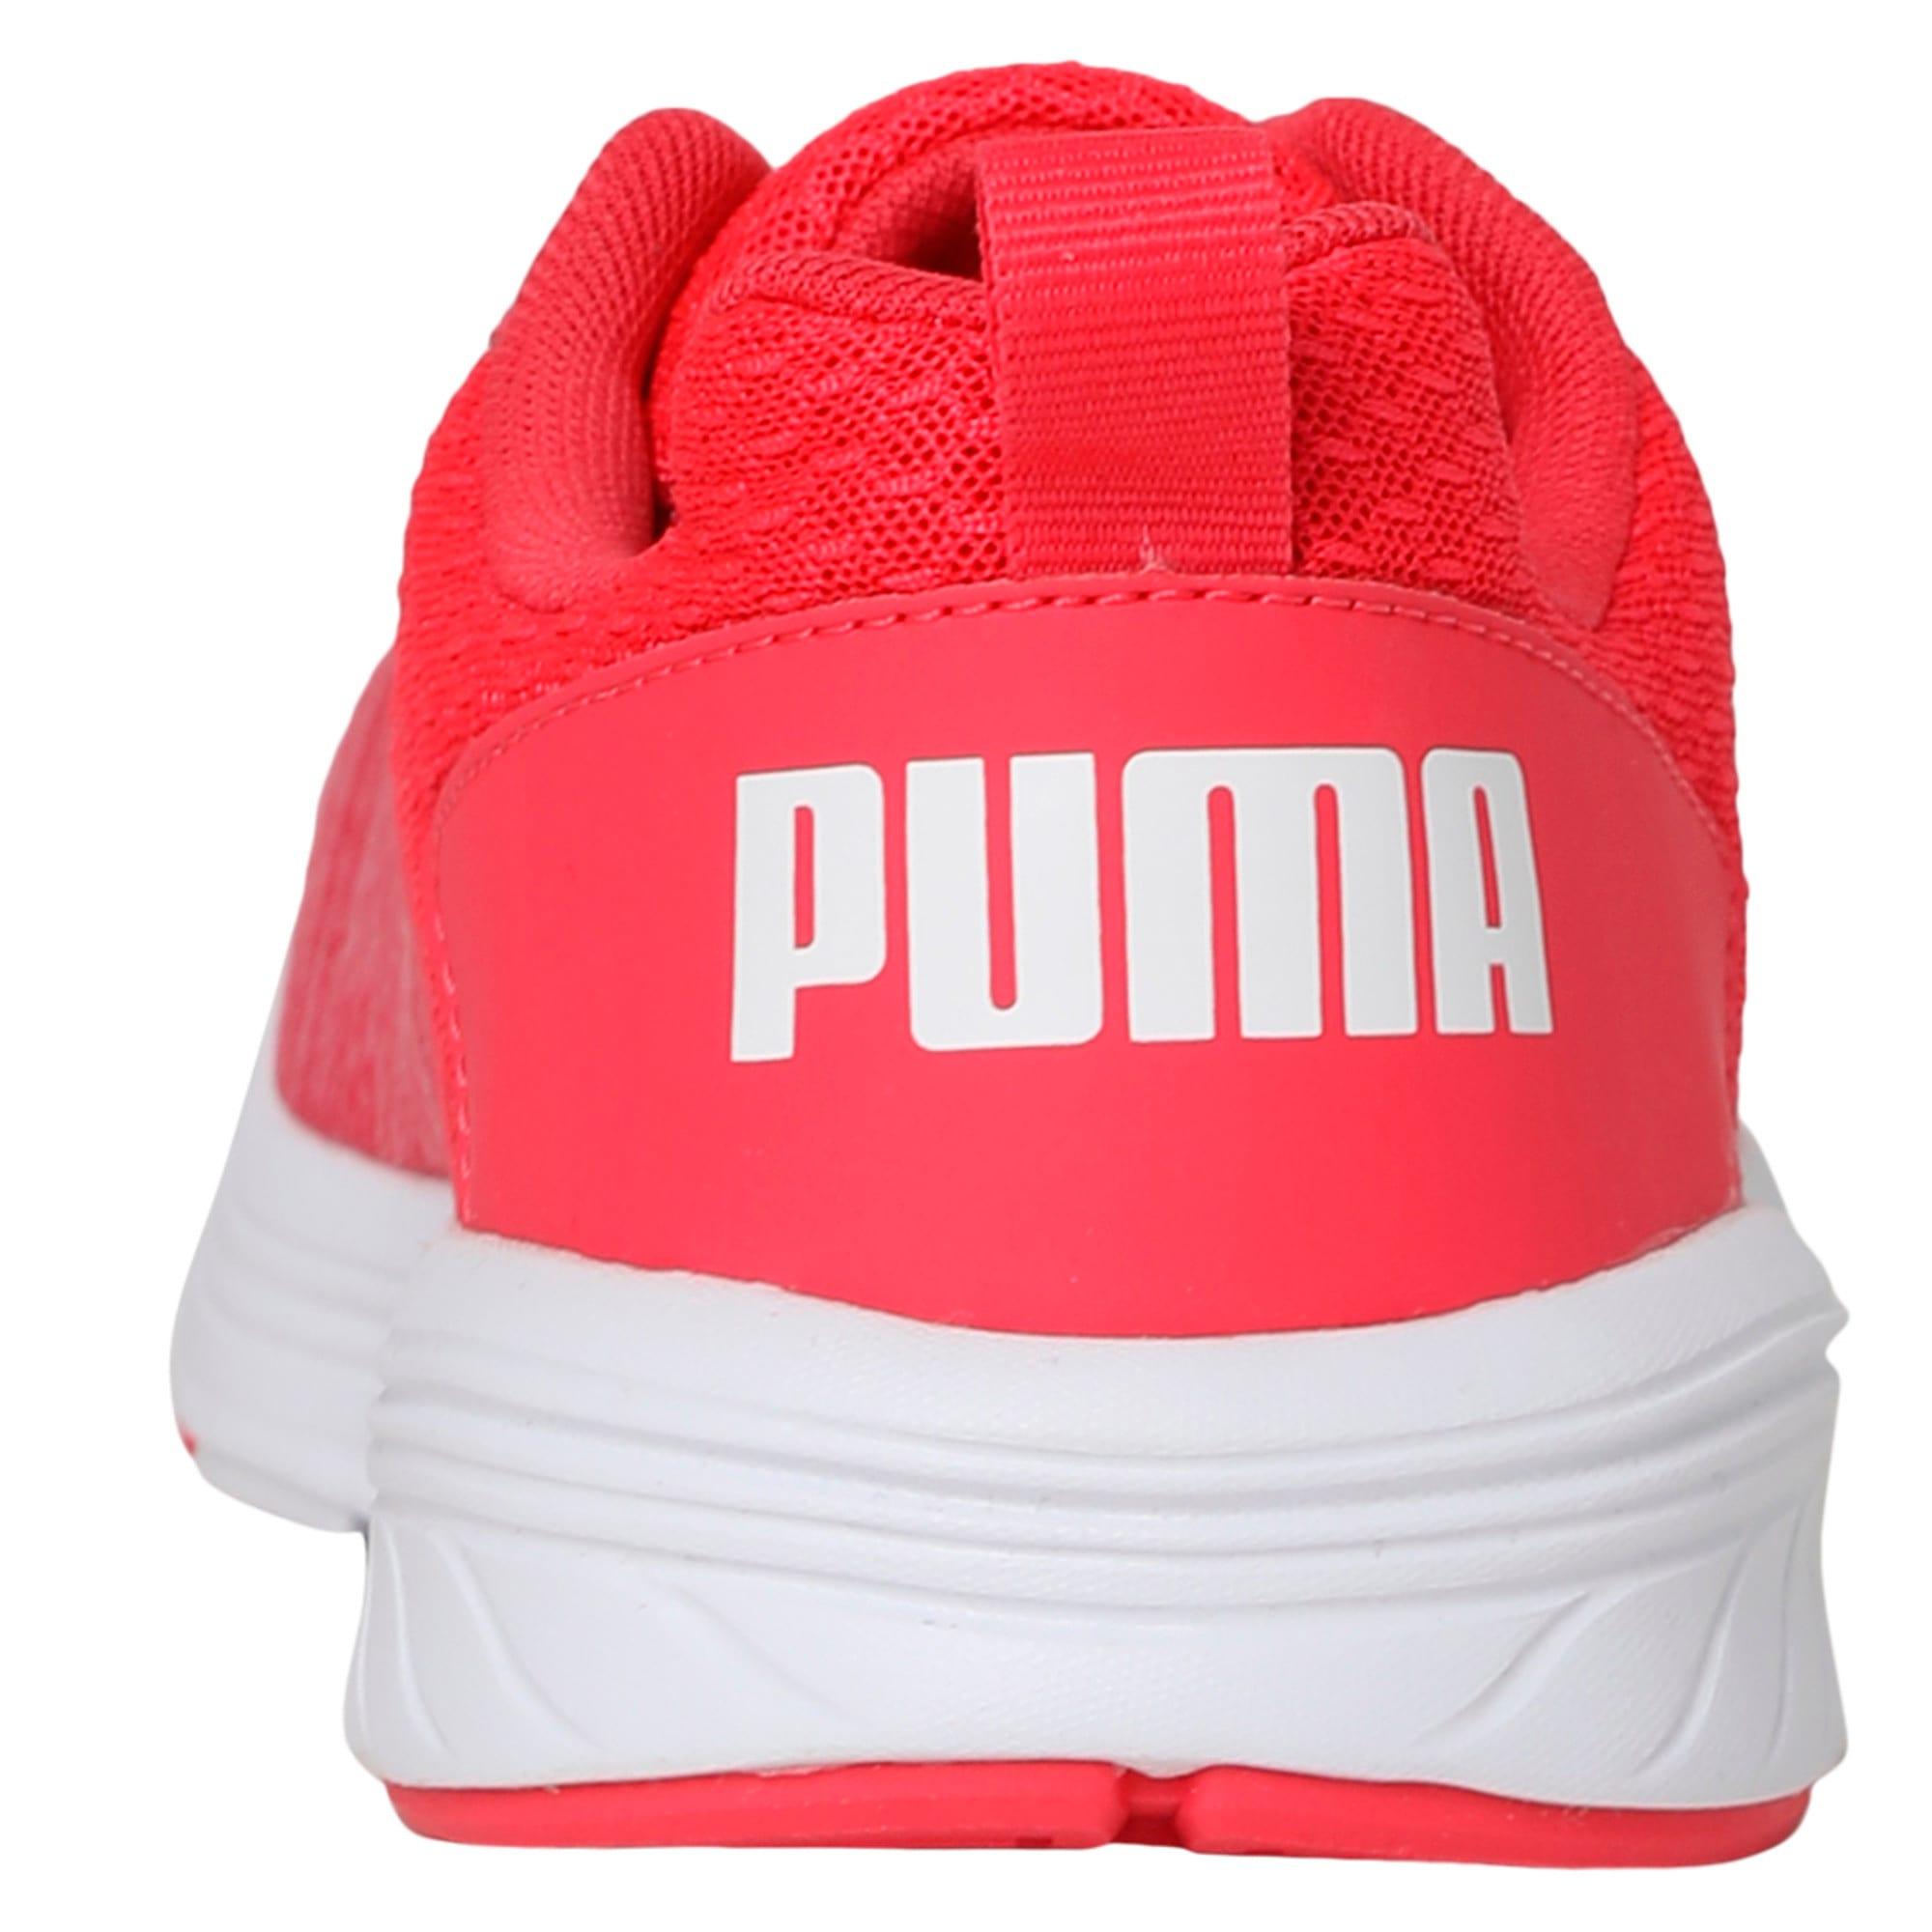 Thumbnail 4 of NRGY Comet Kids' Training Shoes, White-Paradise Pink-White, medium-IND